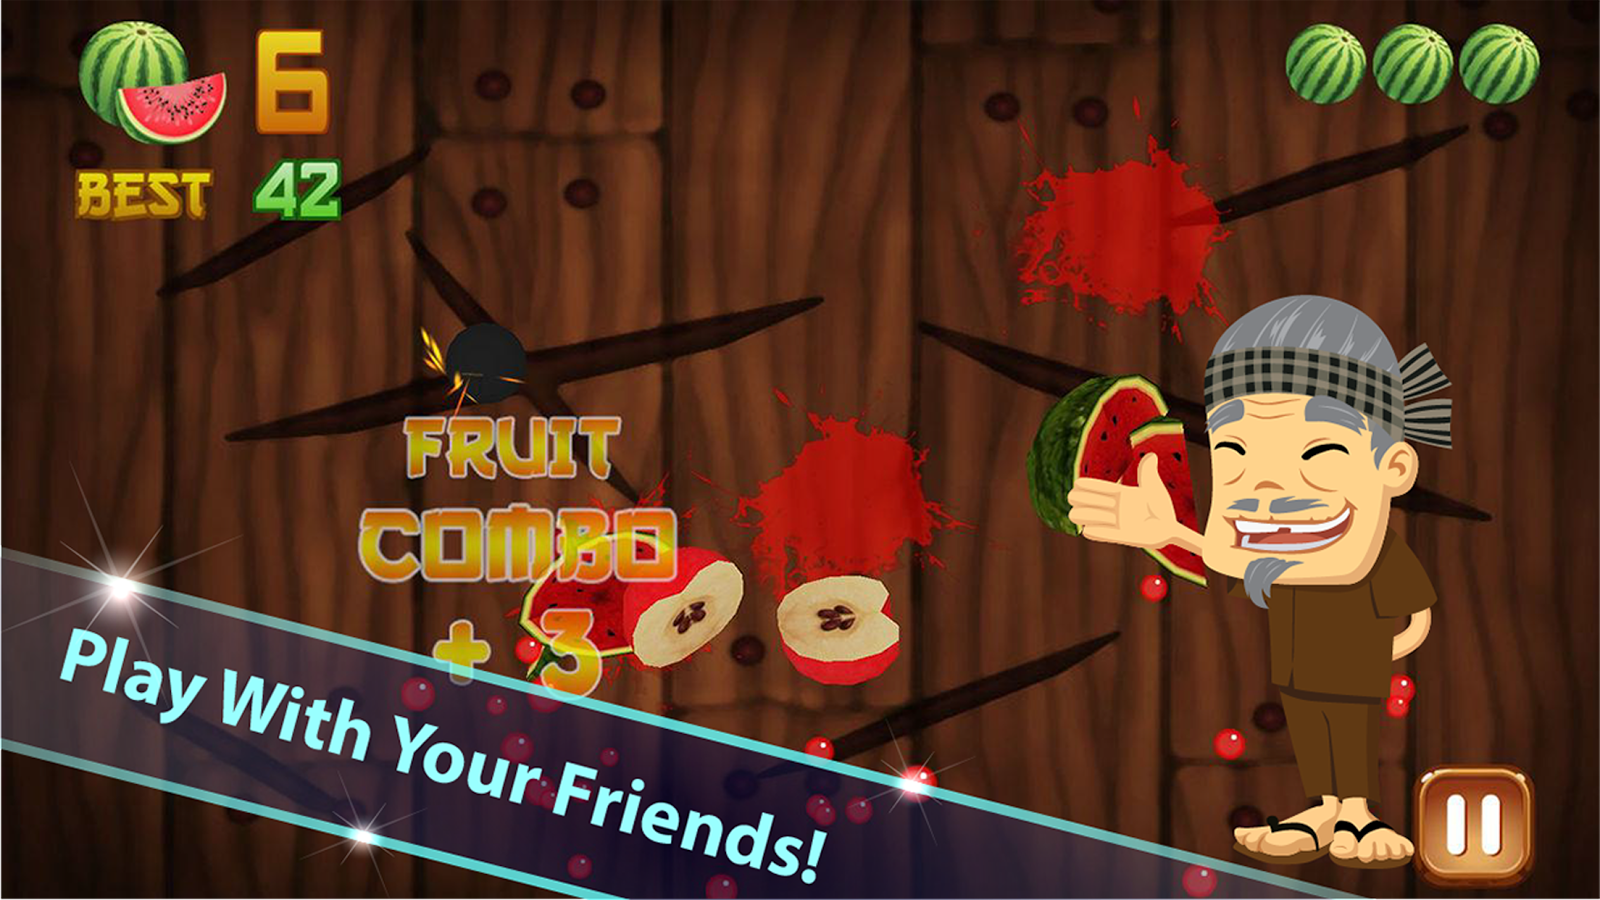 Fruit bump game free download - Fruit Cut Mini Free Screenshot